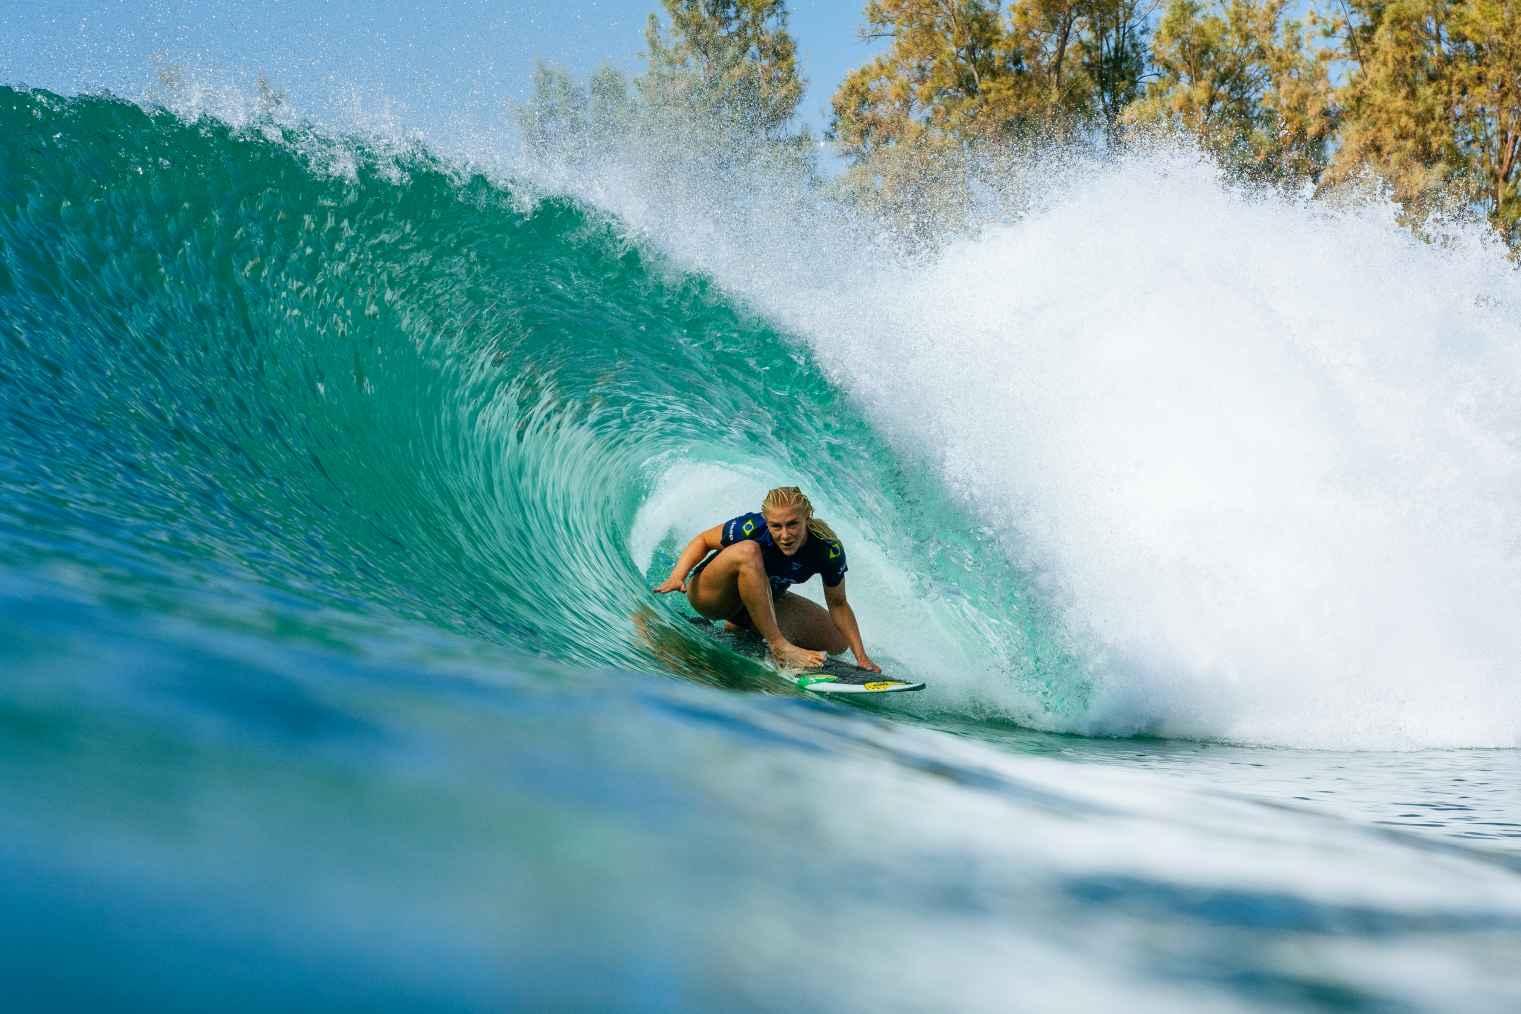 surf30 surf ranch pro 2021 wsl surf Weston Webb T Ranch21 PNN 1927